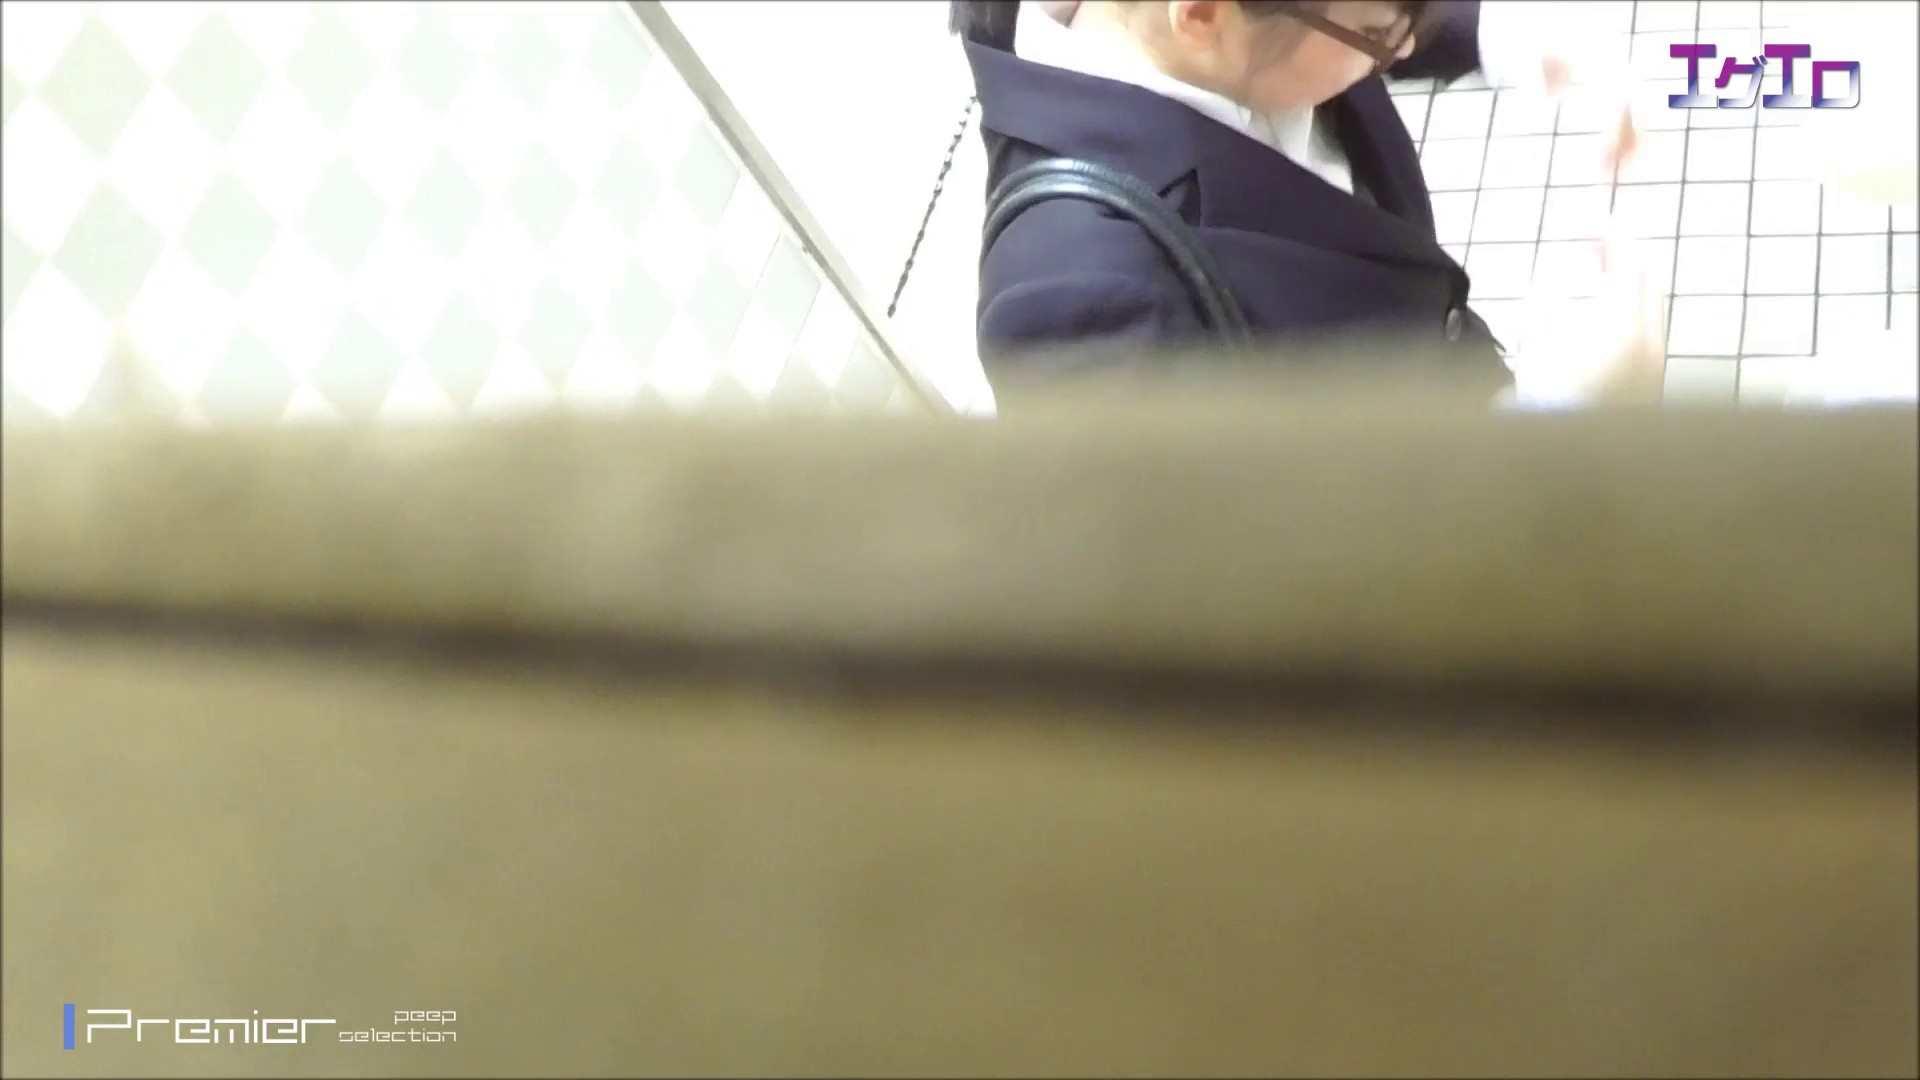 【33位 2016】至近距離洗面所 Vol.03 OLハメ撮り  106Pix 99